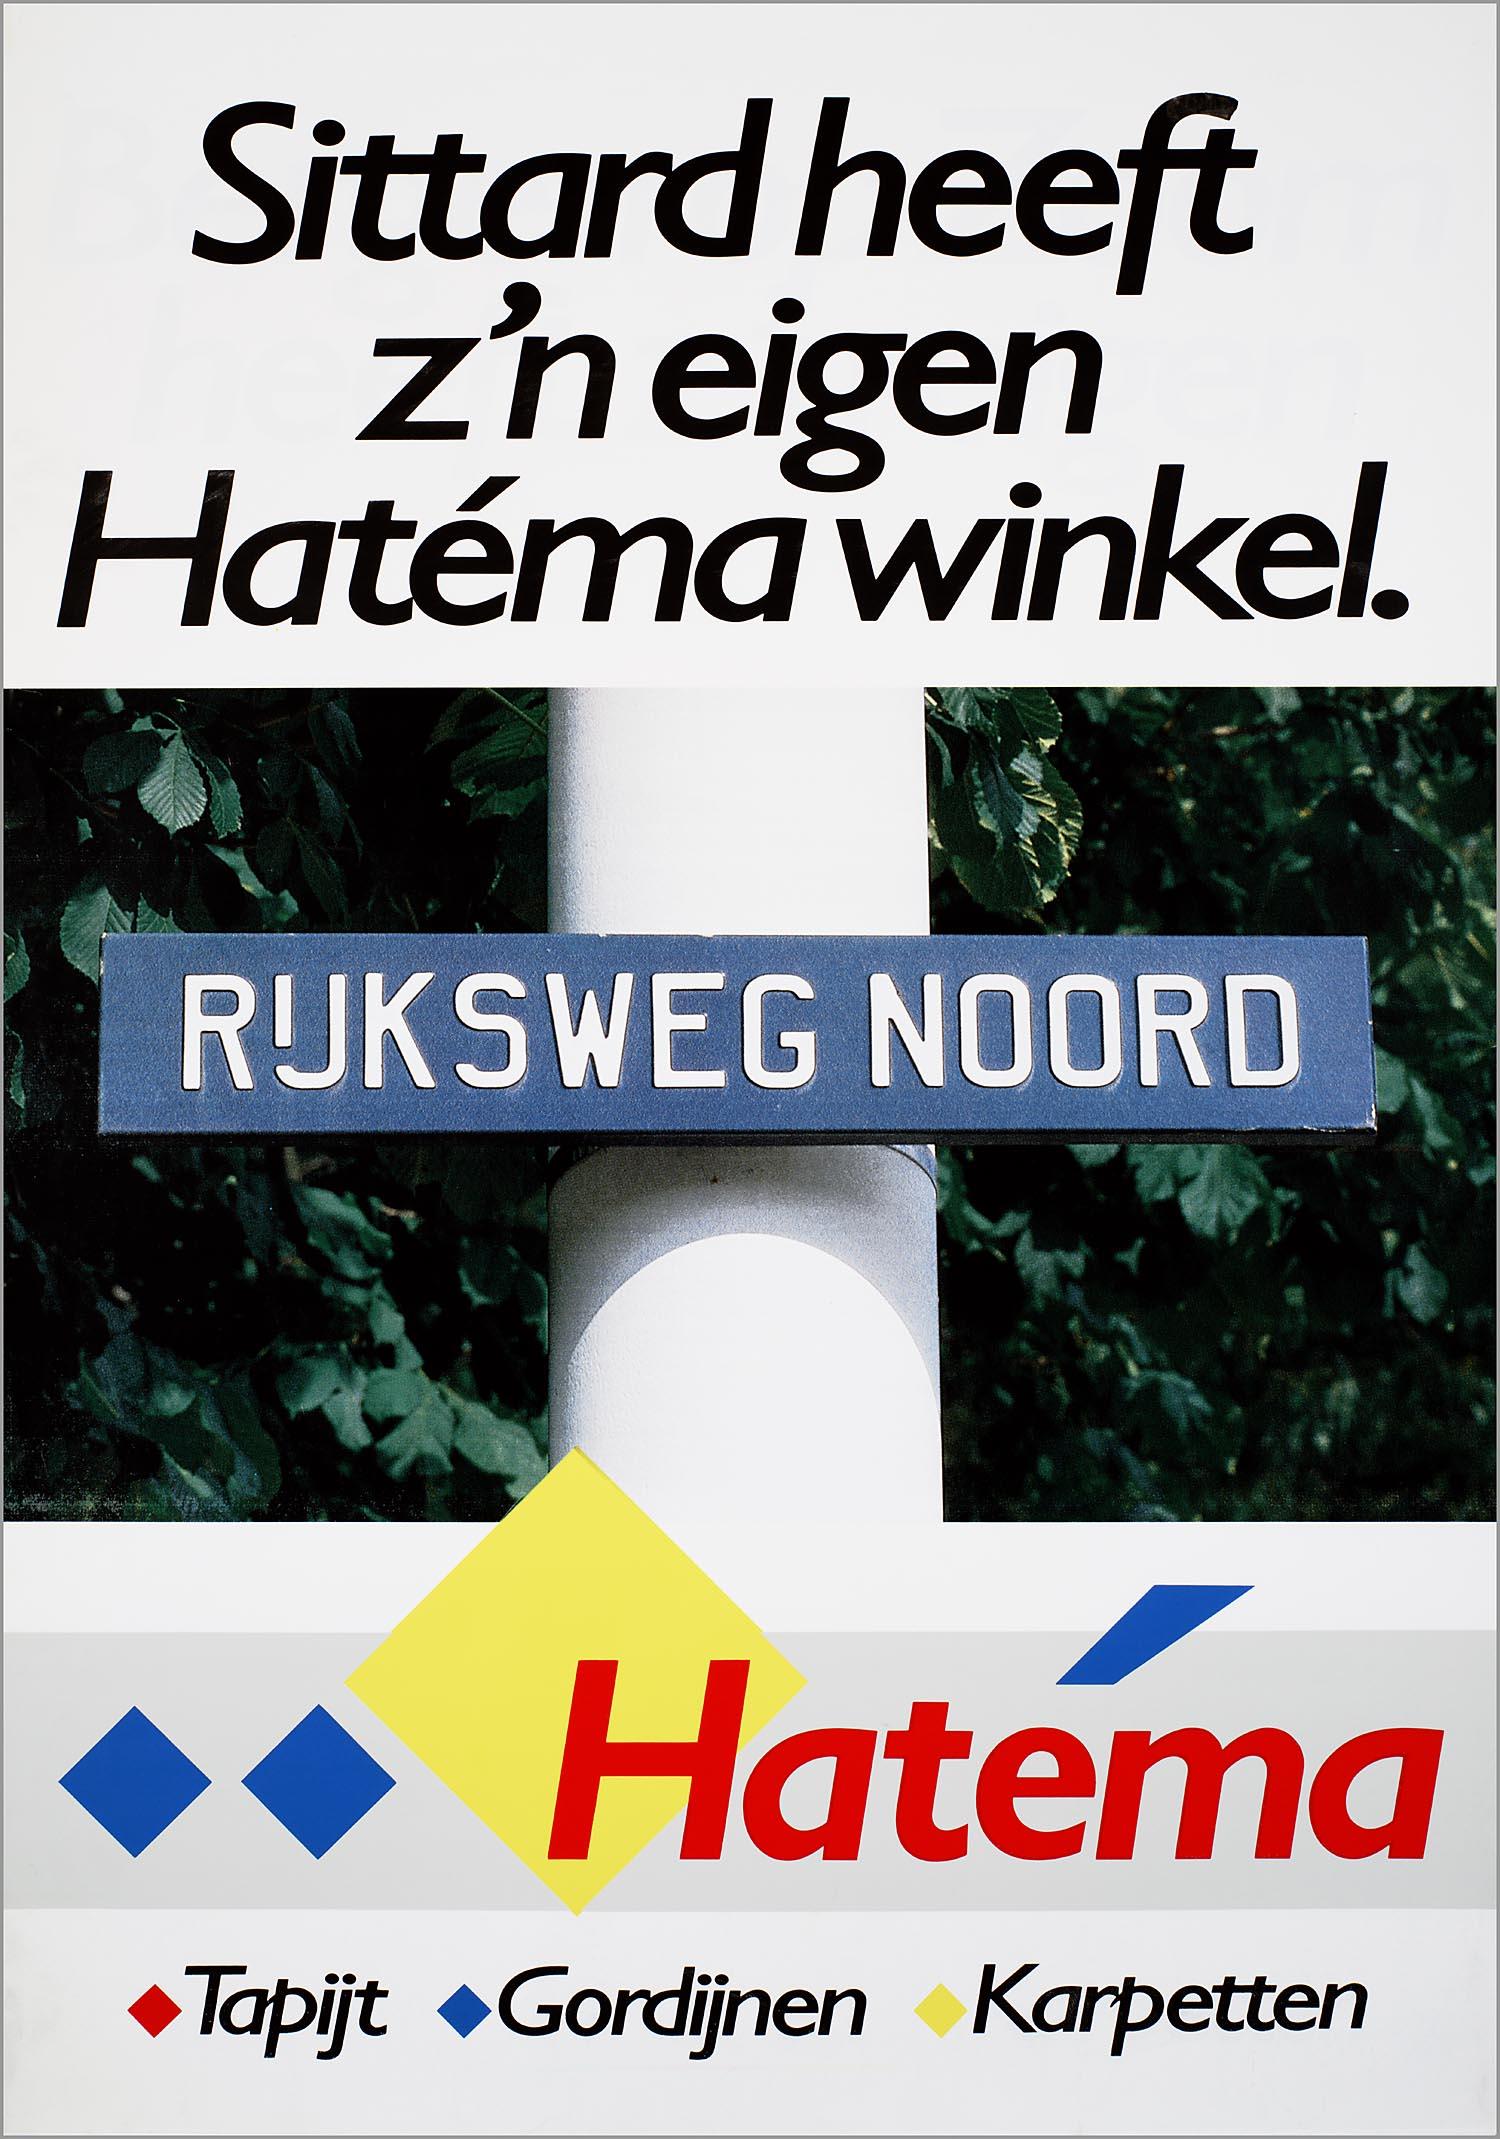 http://resolver.kb.nl/resolve?urn=urn:gvn:RA01:30051001548608&size=large